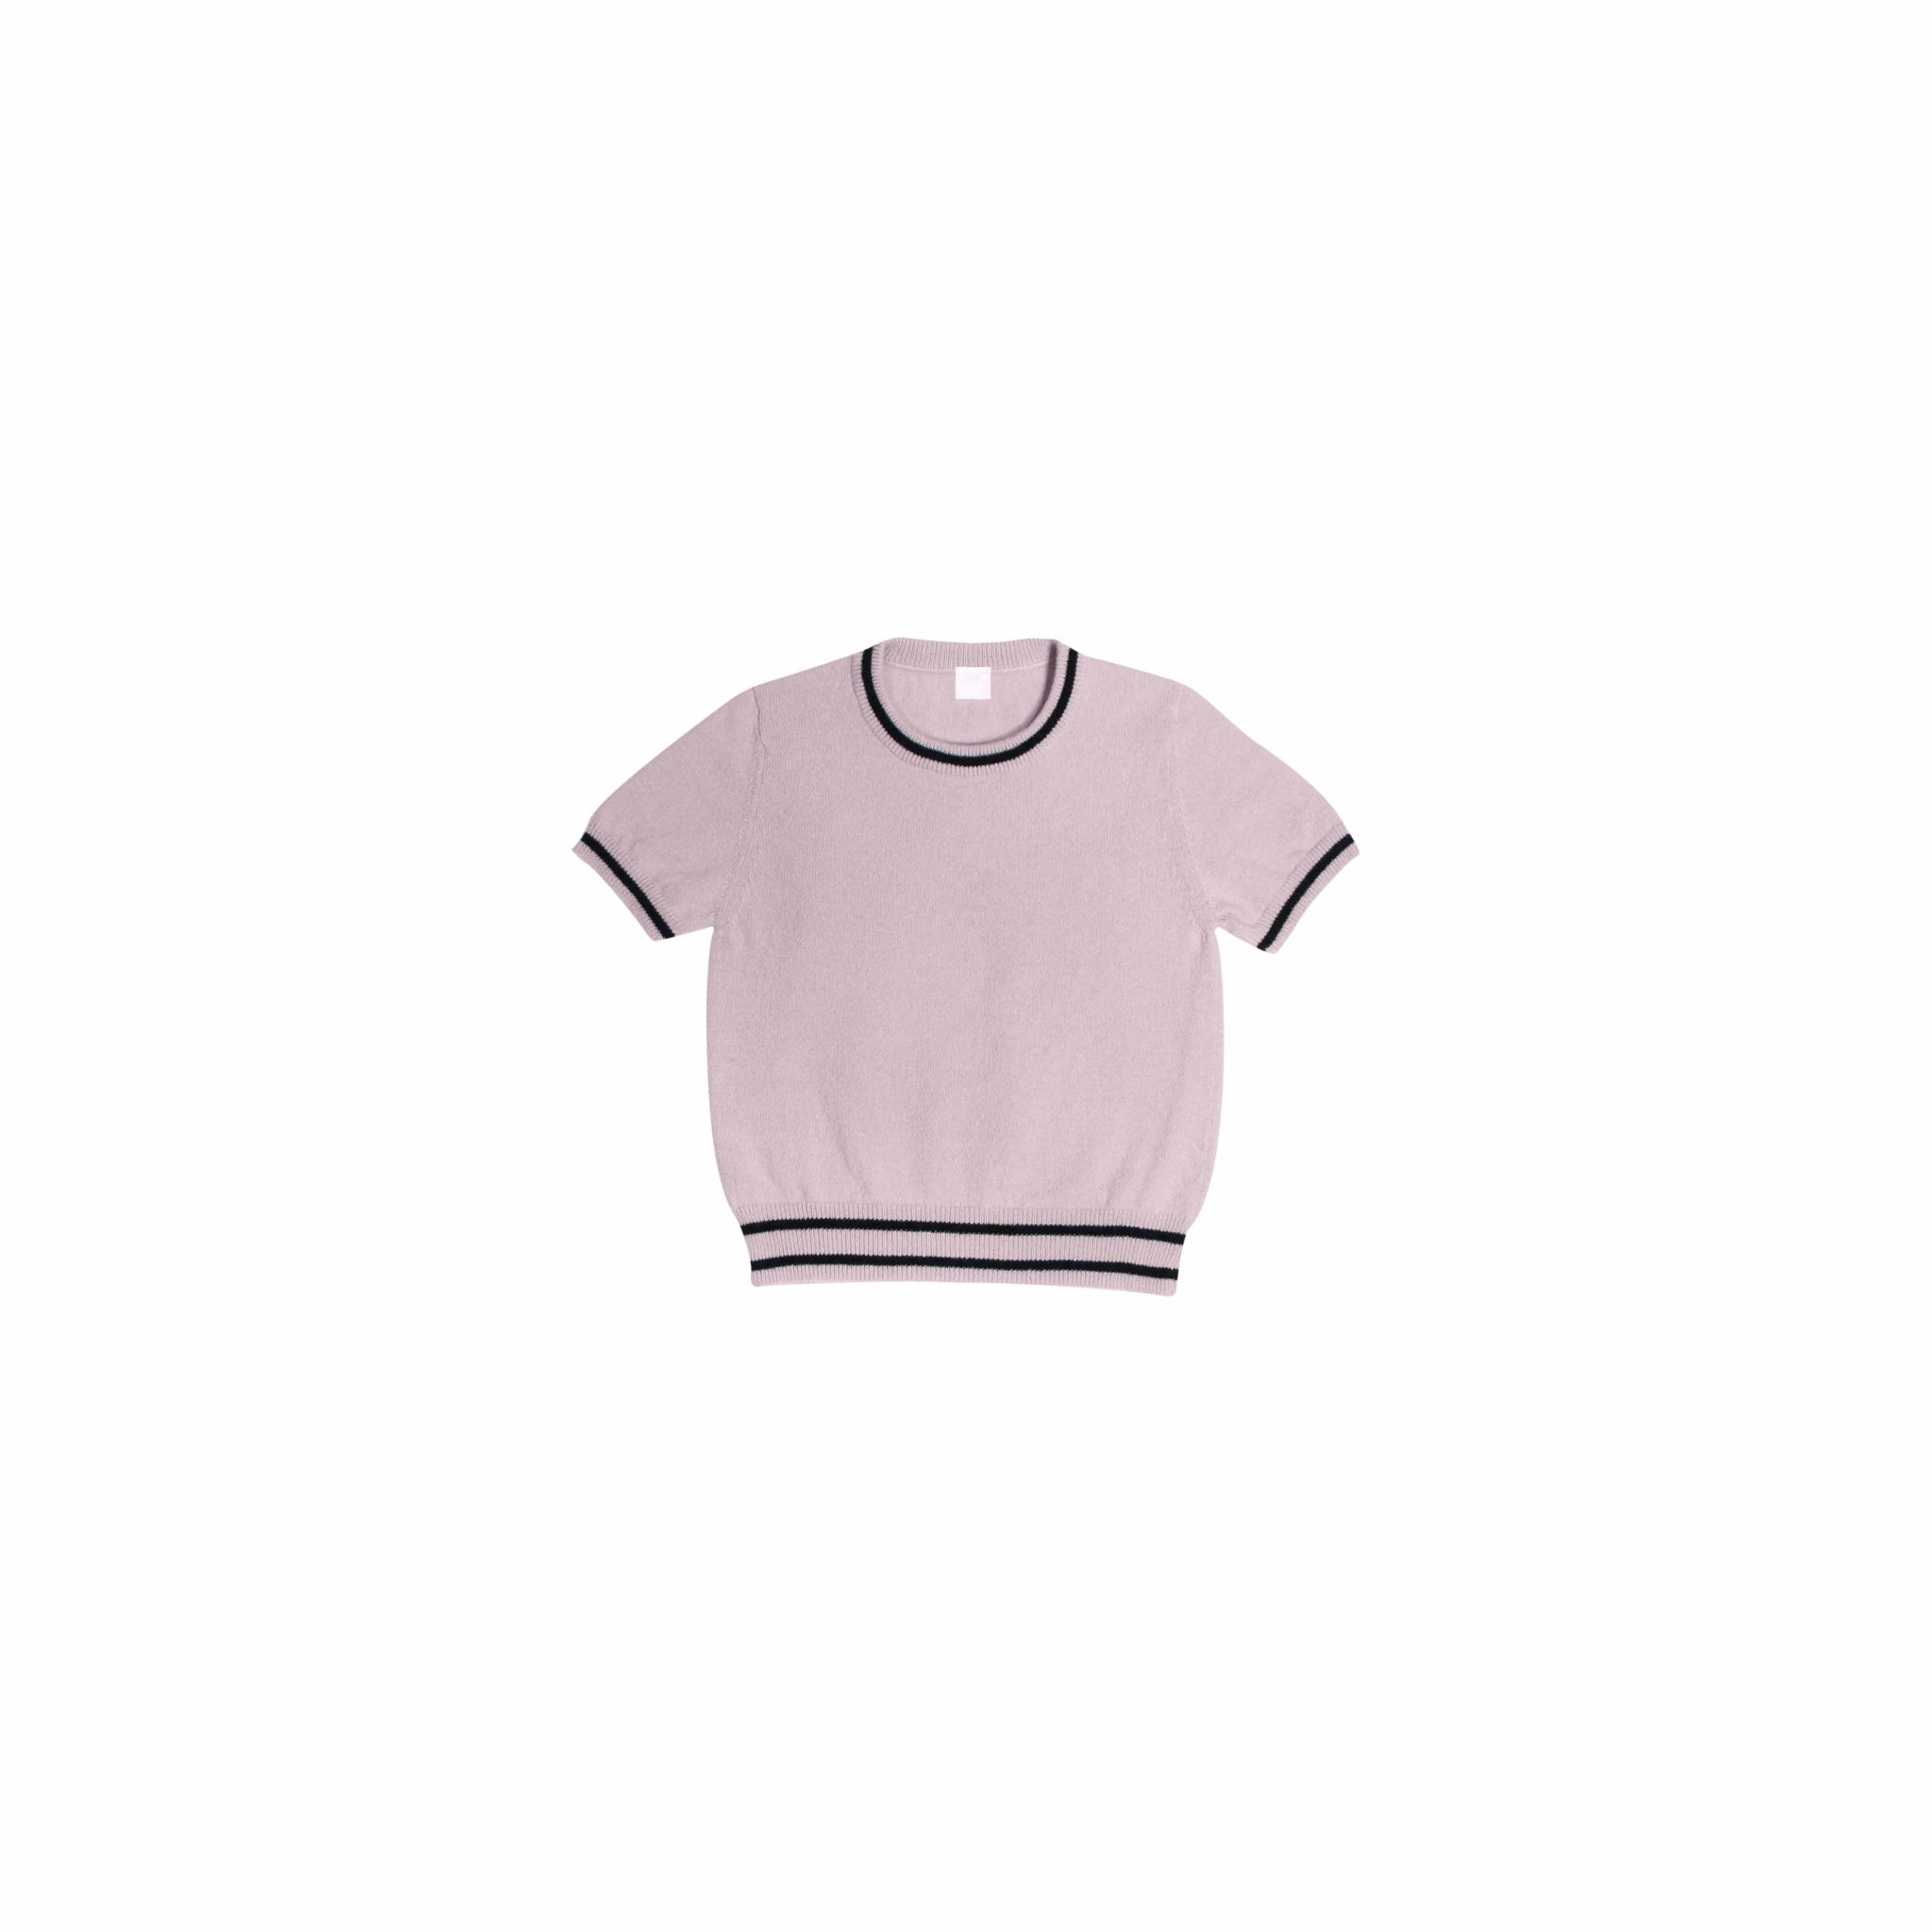 Short sleeves sweater